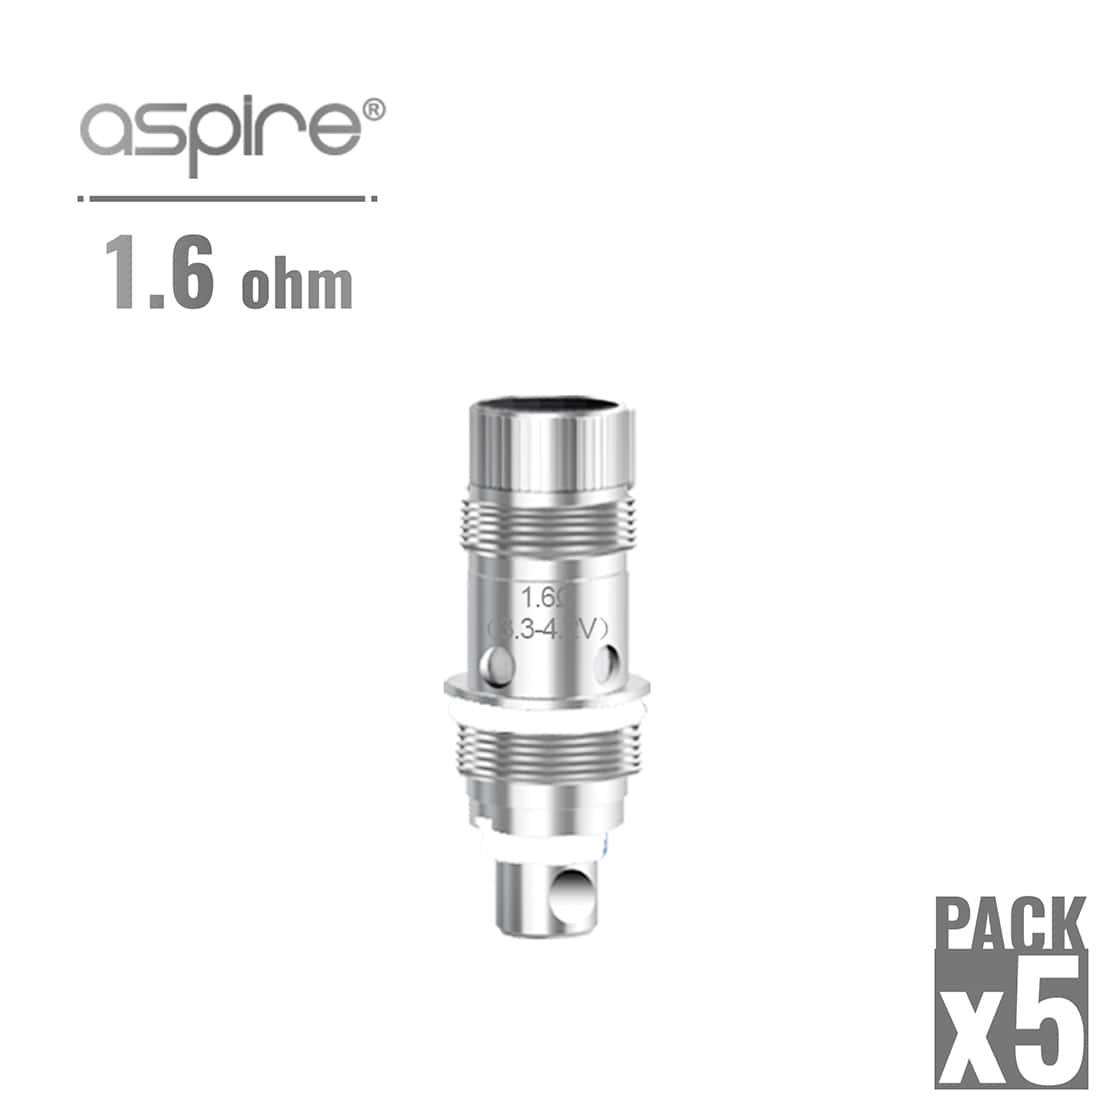 Photo de Atomiseur Aspire Nautilus 1.6 Ohm x 5